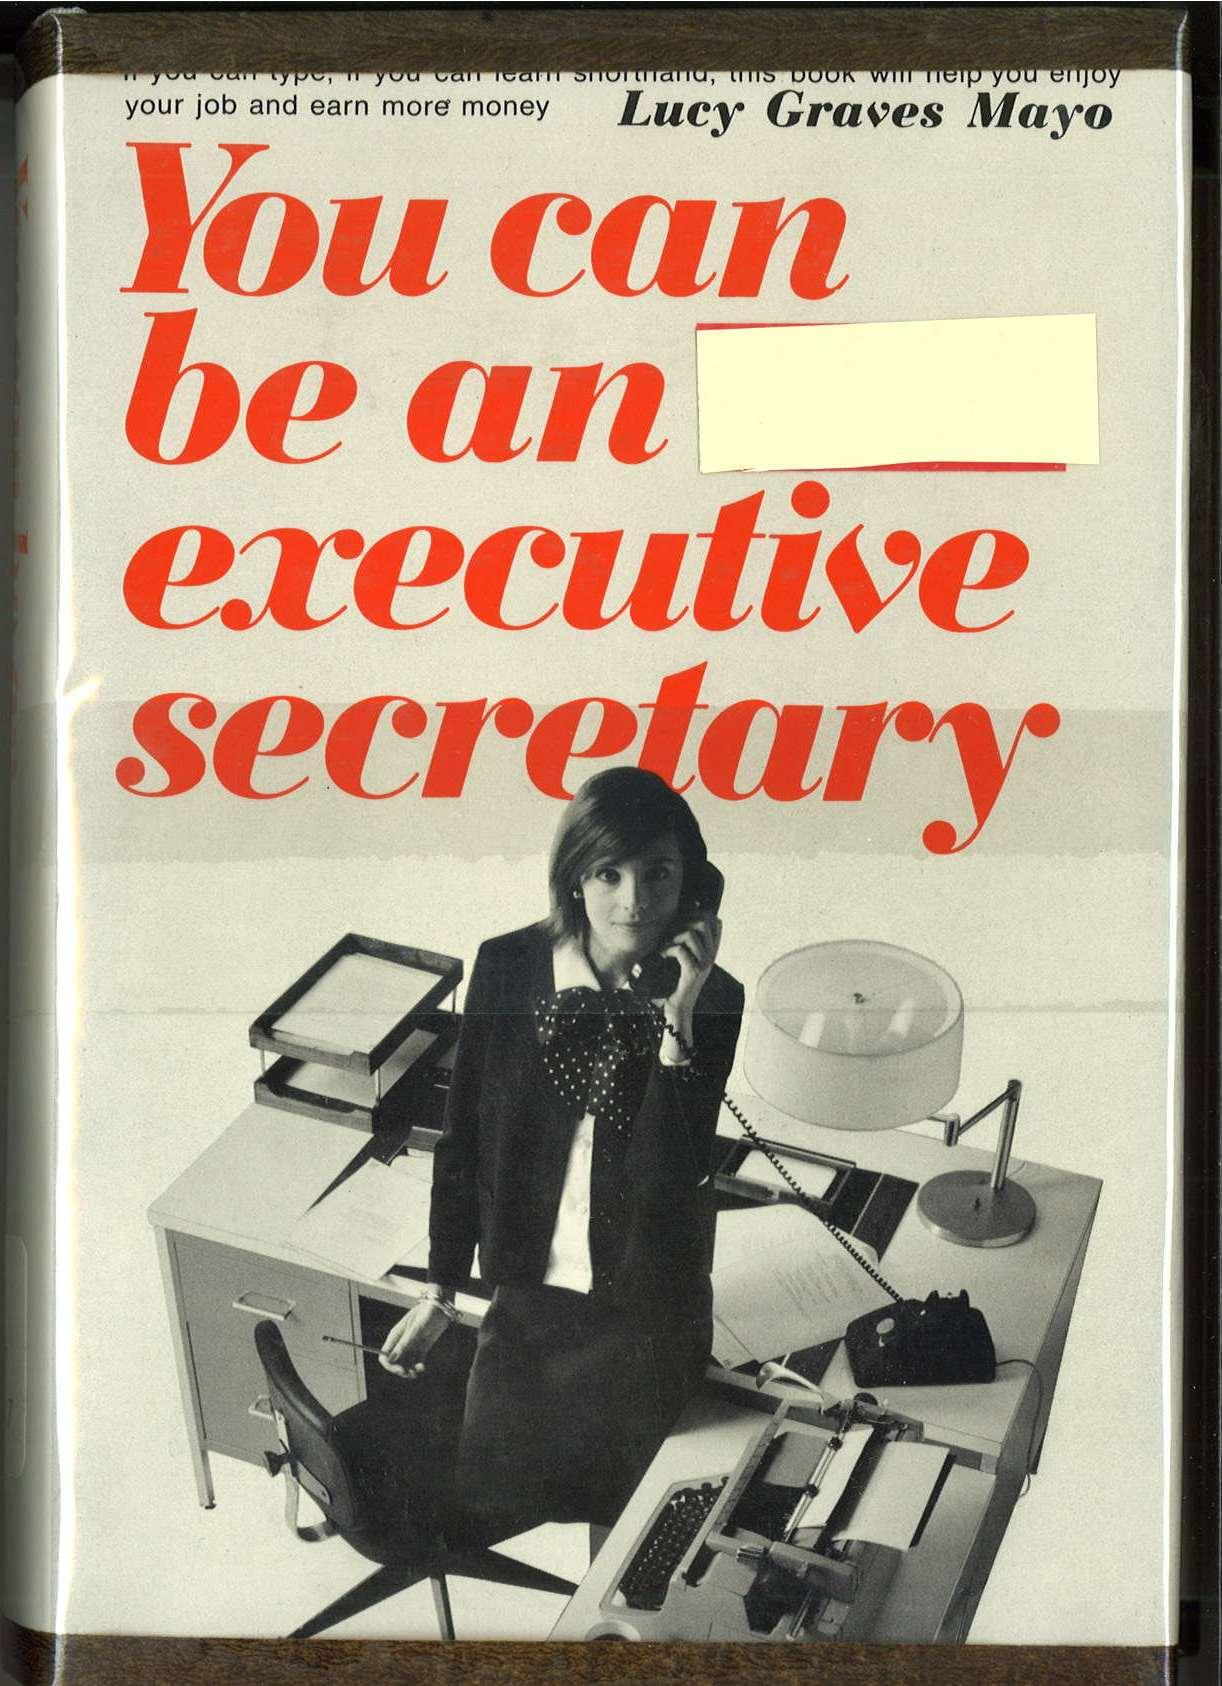 You Can Be an Executive Secretary